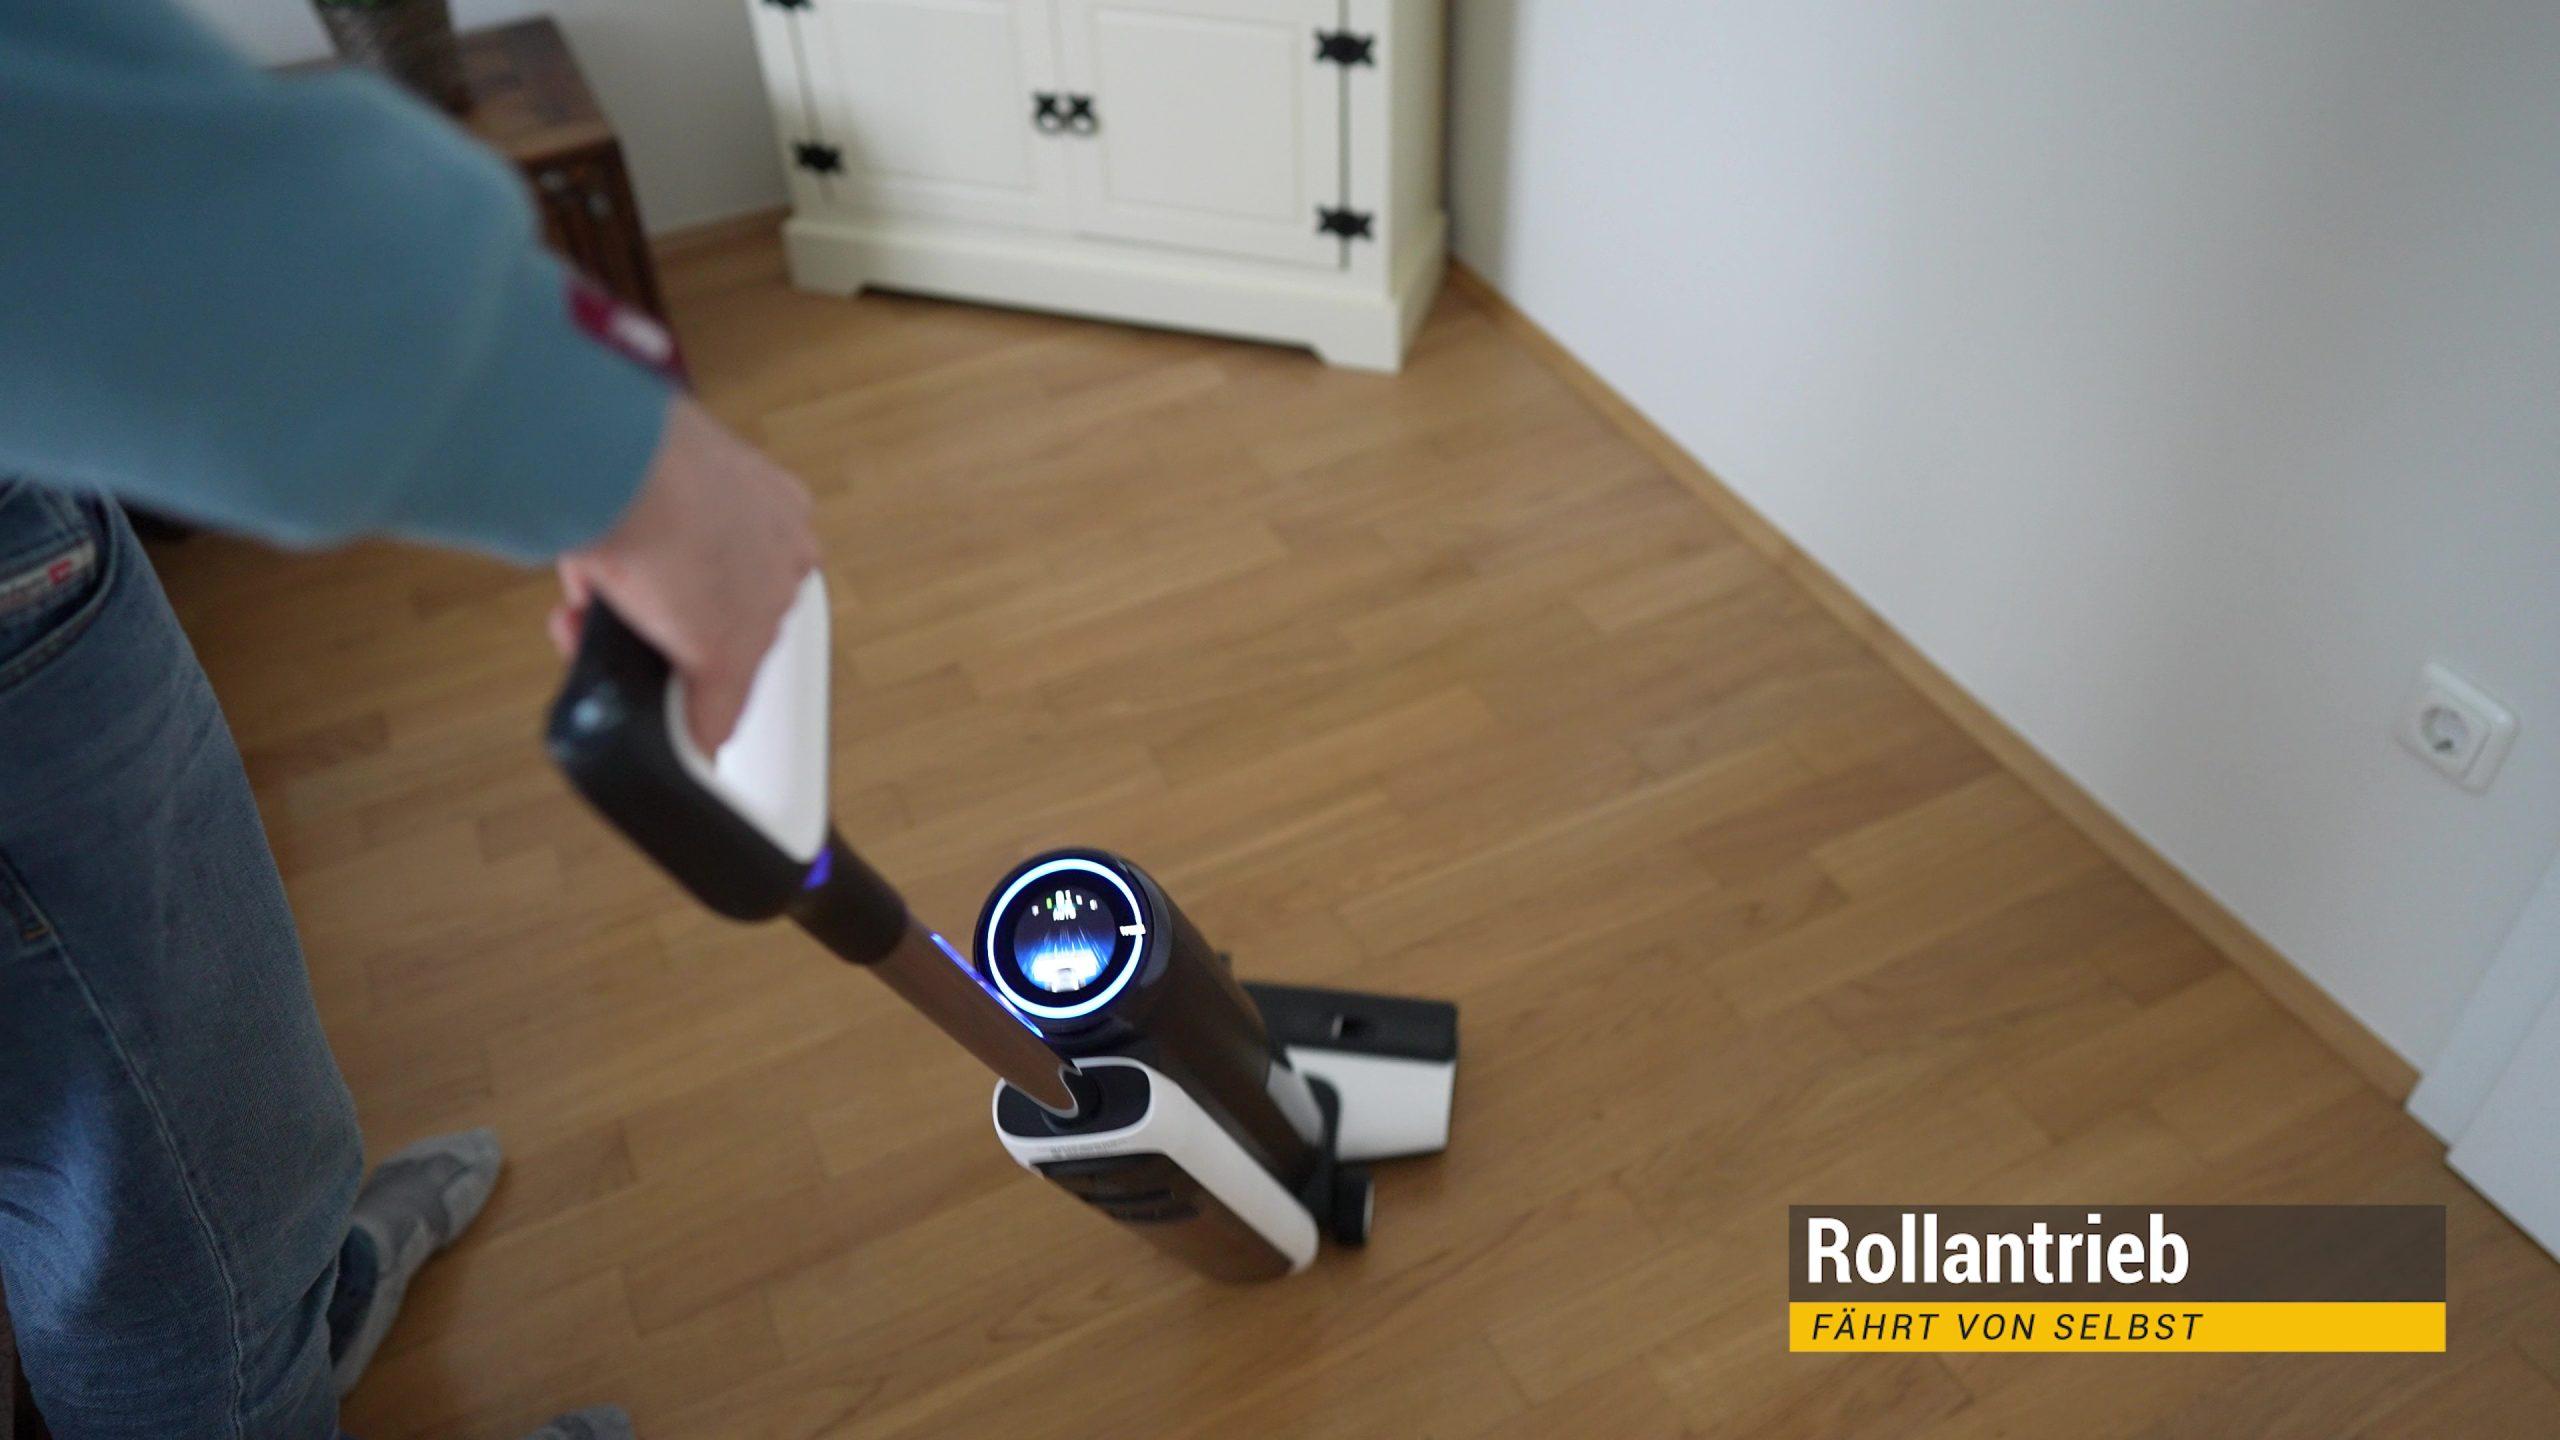 Tineco Floor One S5 Pro Wischsauger Akkusauger Rollantrieb